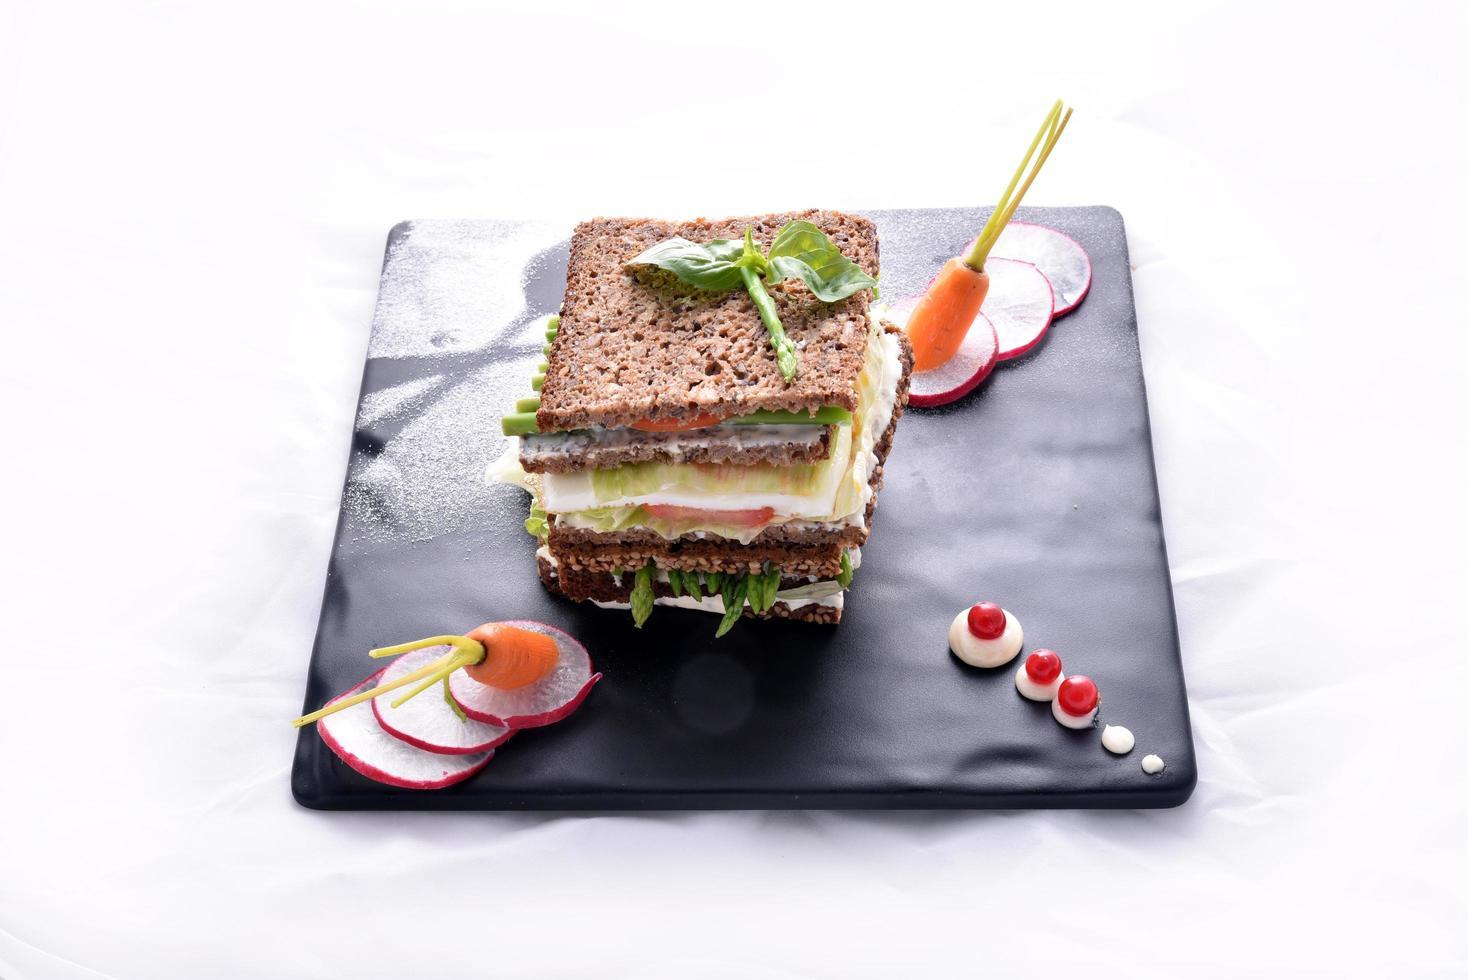 Asparagus sandwich with vegetables photo